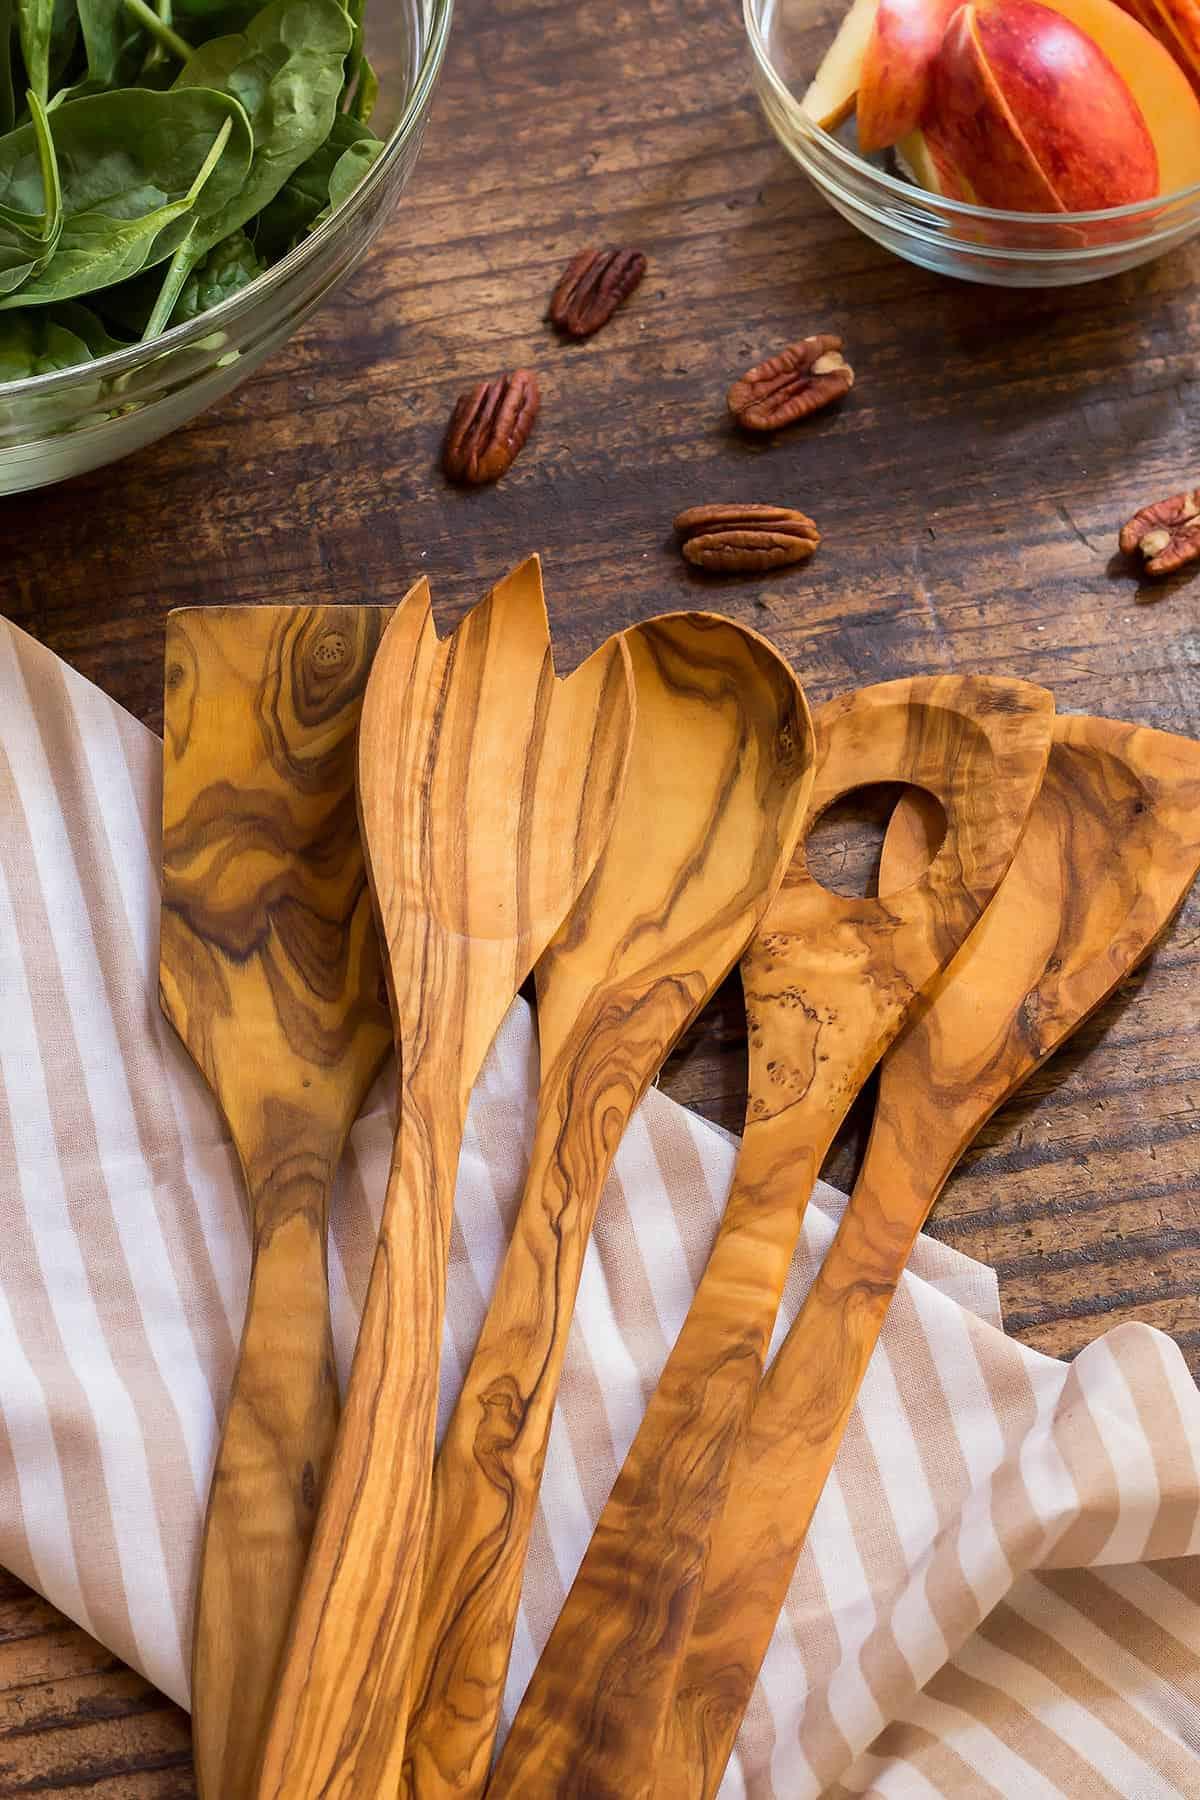 Olive Wood Cooking Utensils